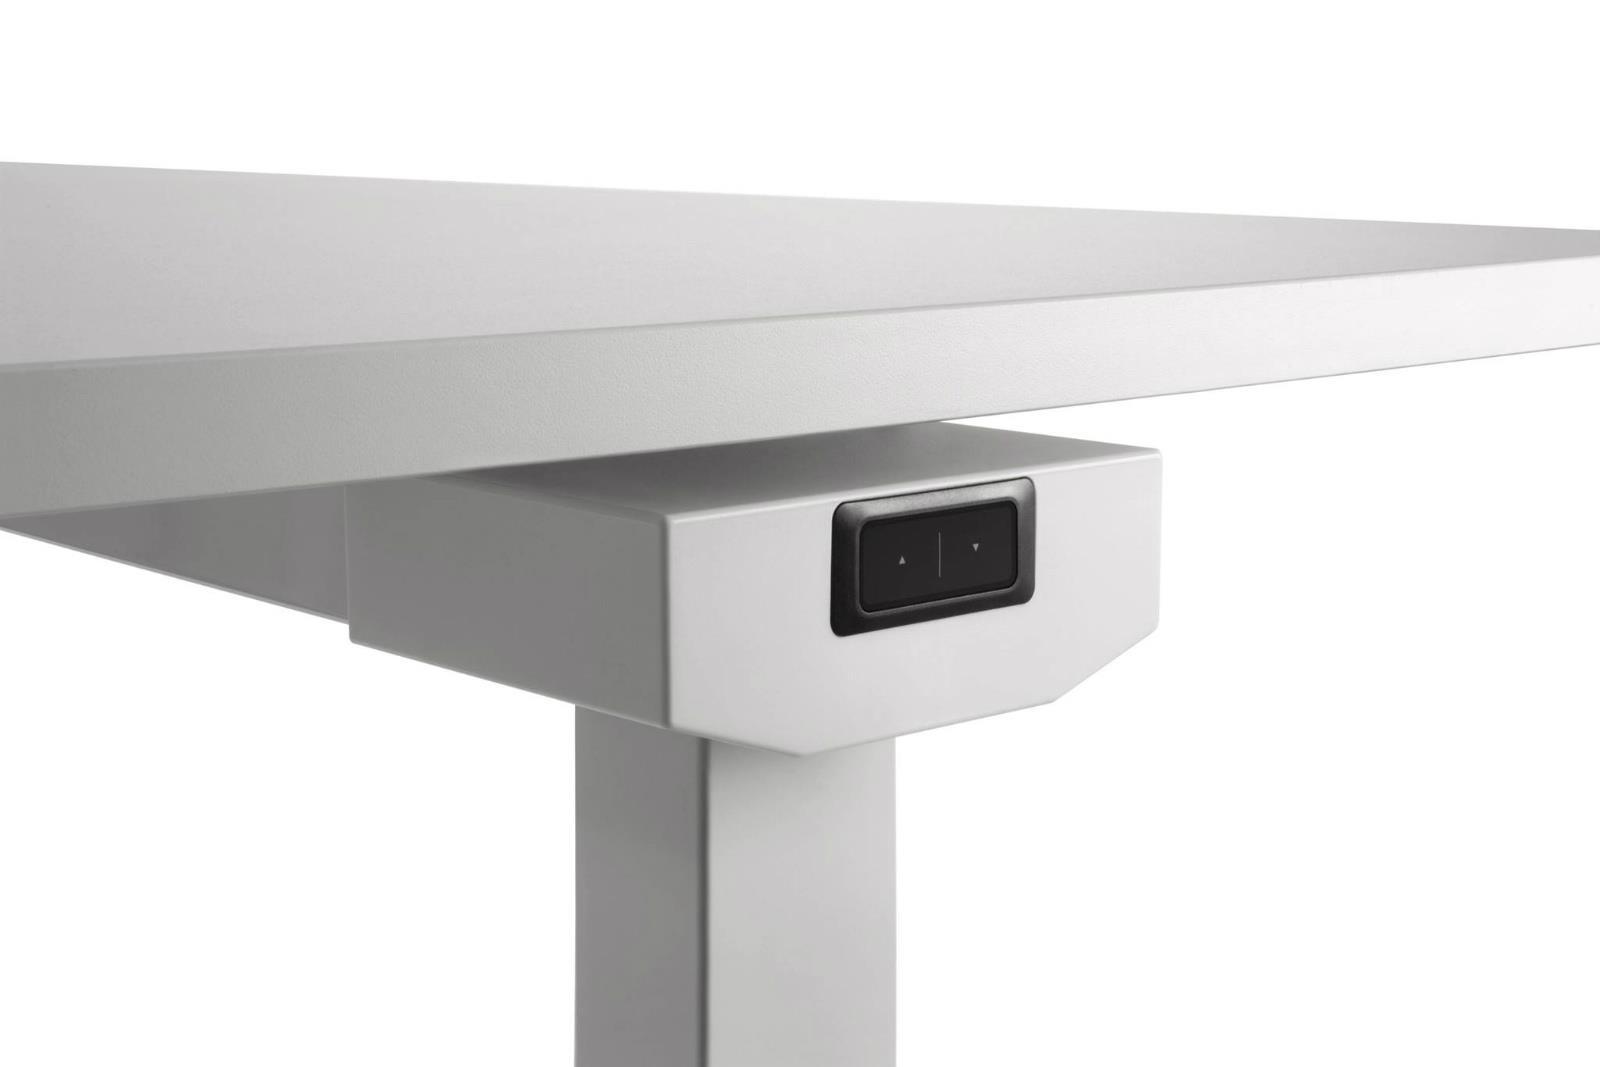 Tavolo regolabile in altezza belardi arredamenti - Tavolo regolabile in altezza ...